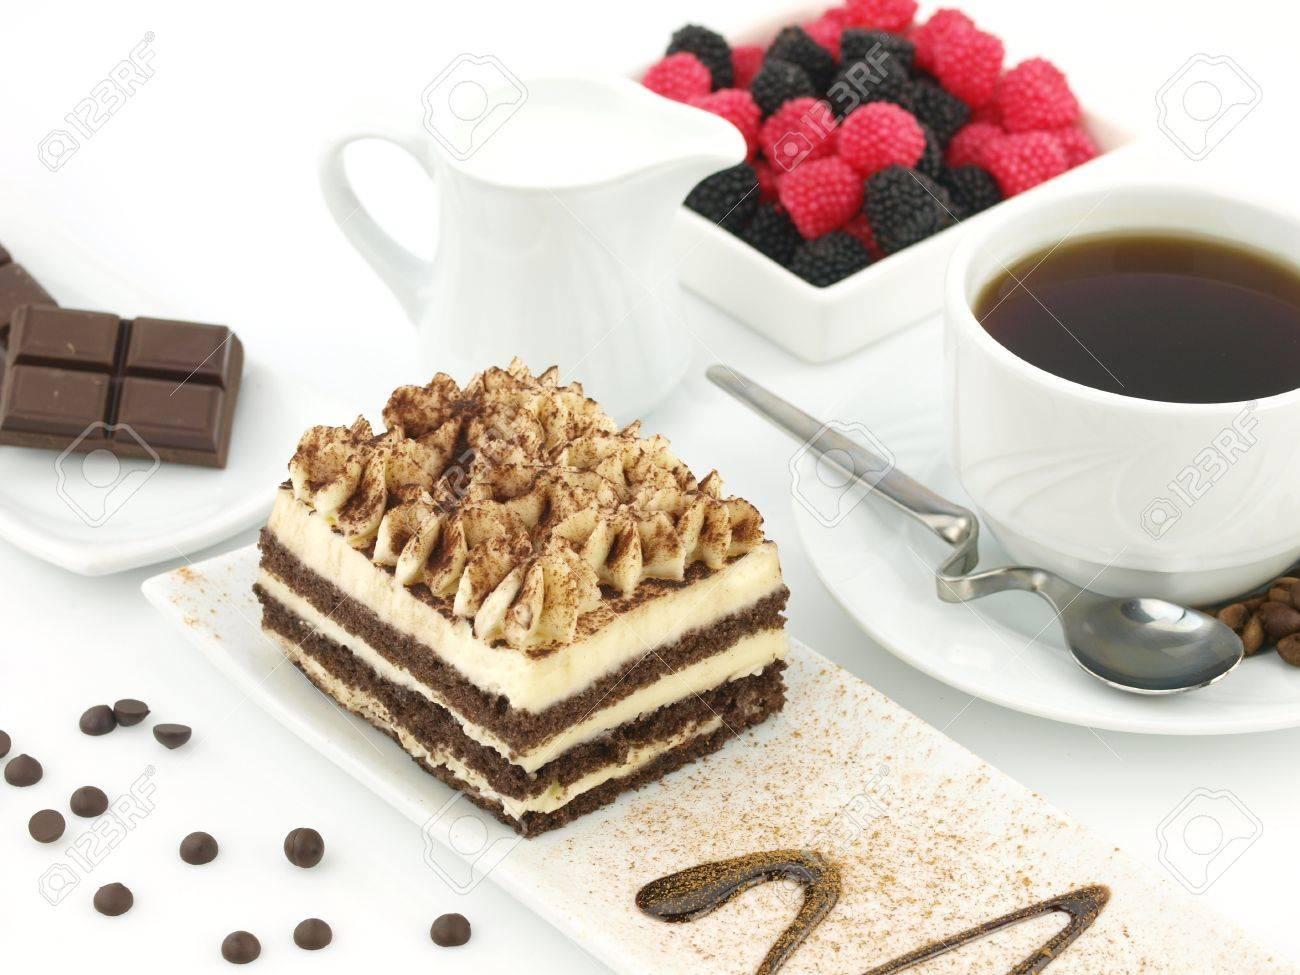 9102780-Tiramisu-dessert-and-a-cup-of-co